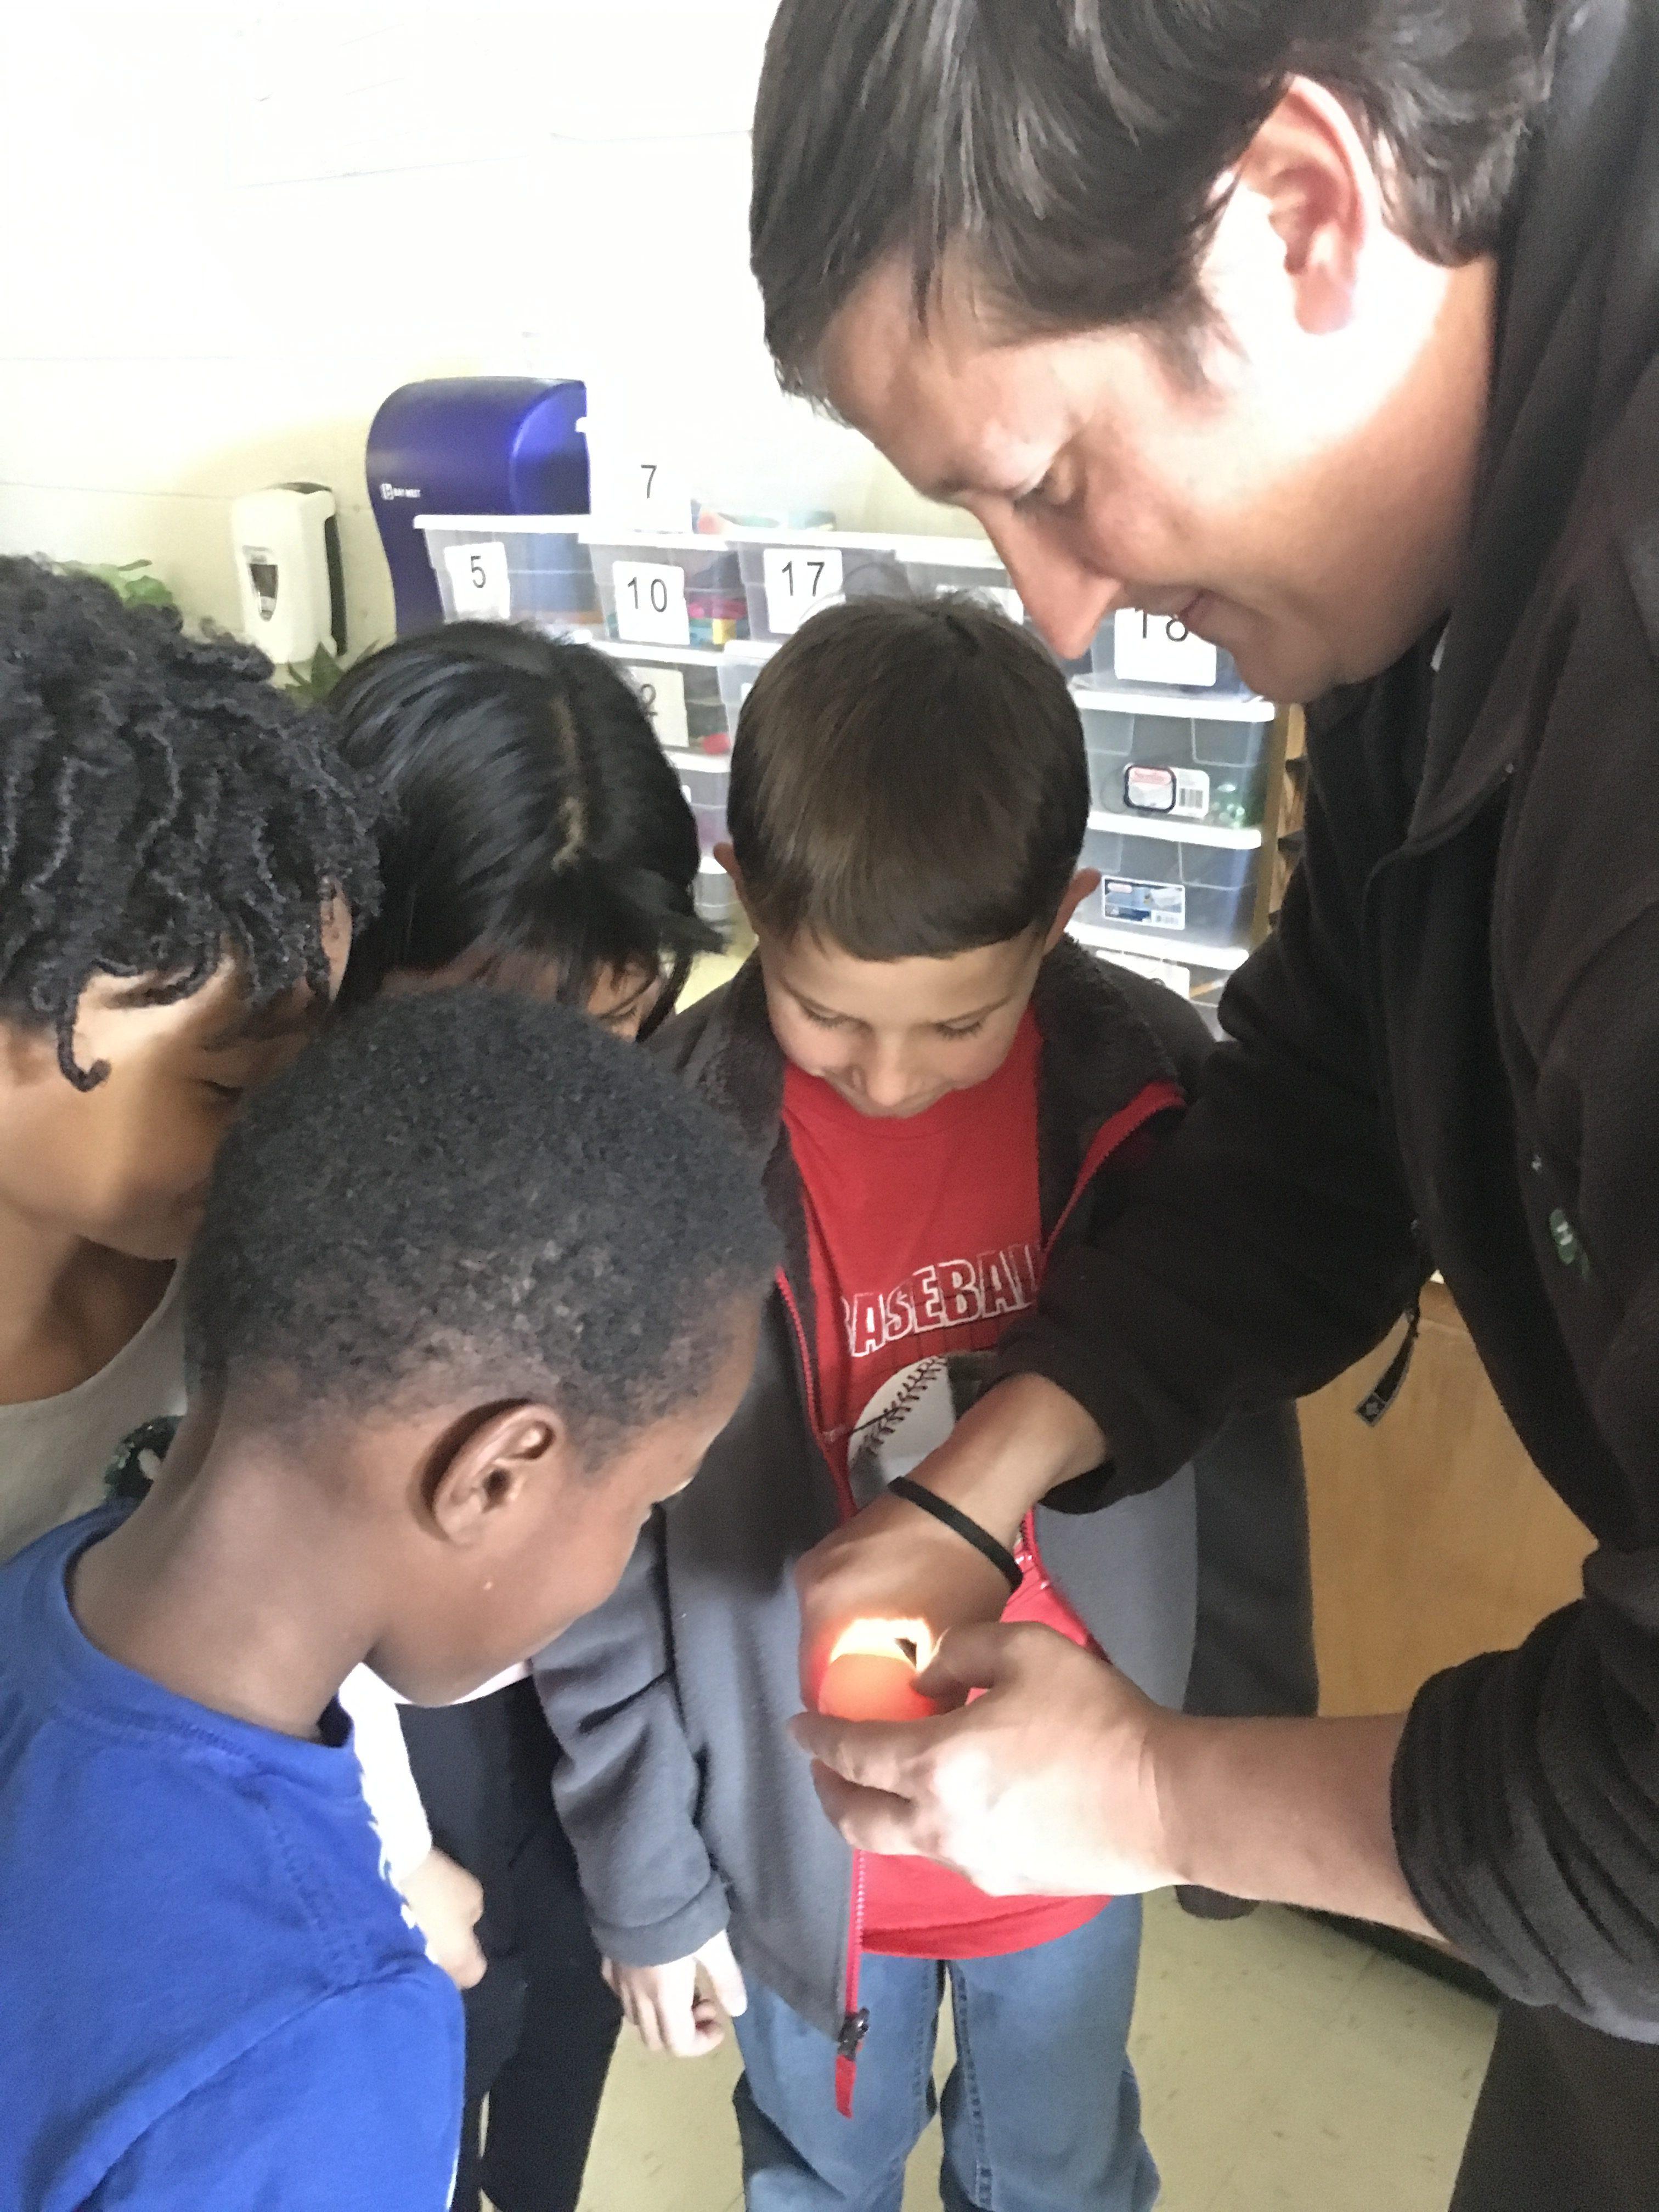 Kids looking at egg